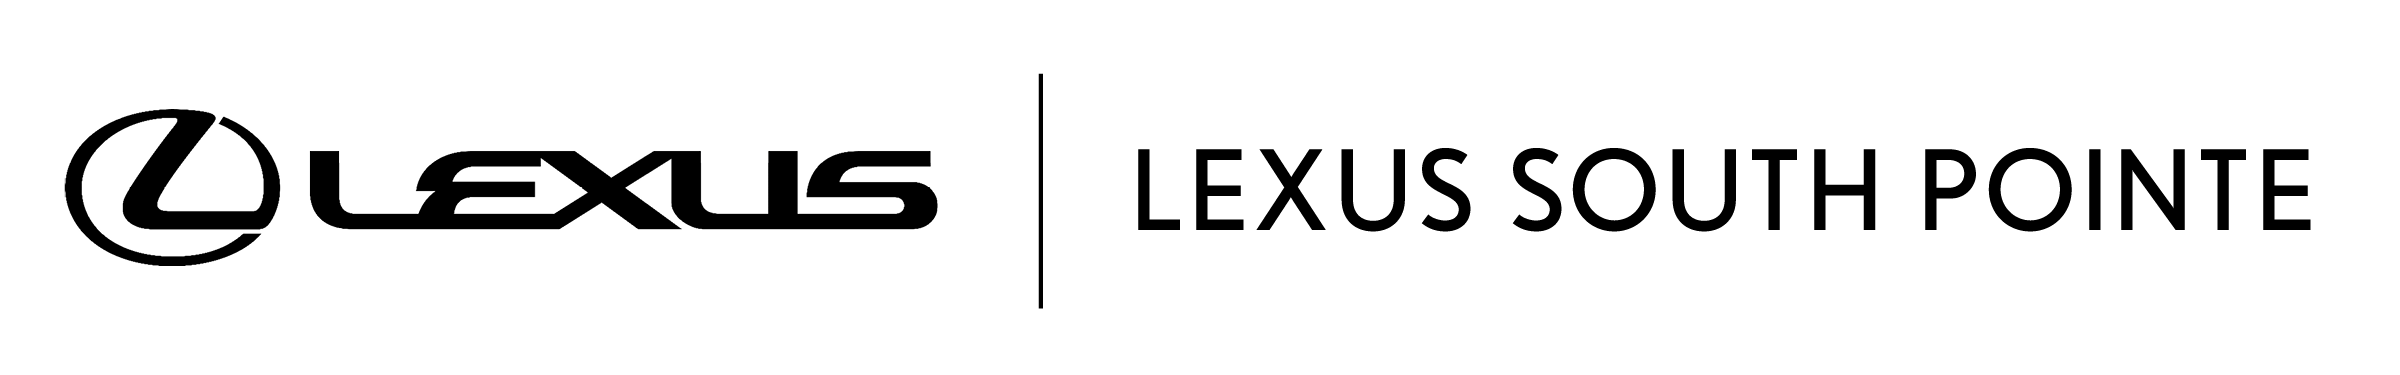 Hole Sponsors - Lexus South Pointe - Logo